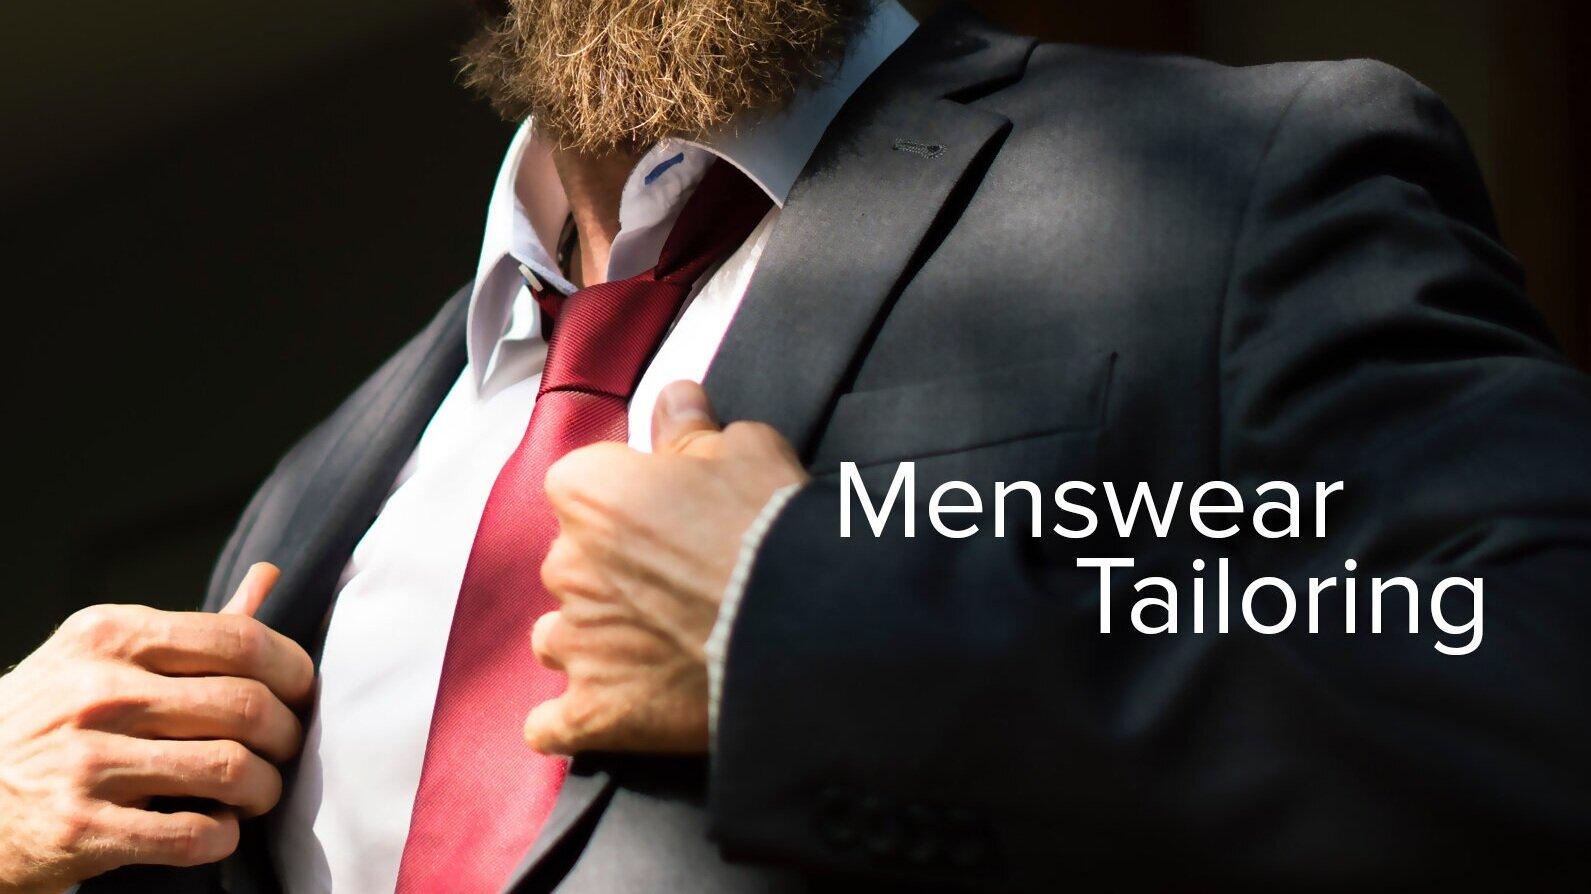 MenswearTailoring921.jpg